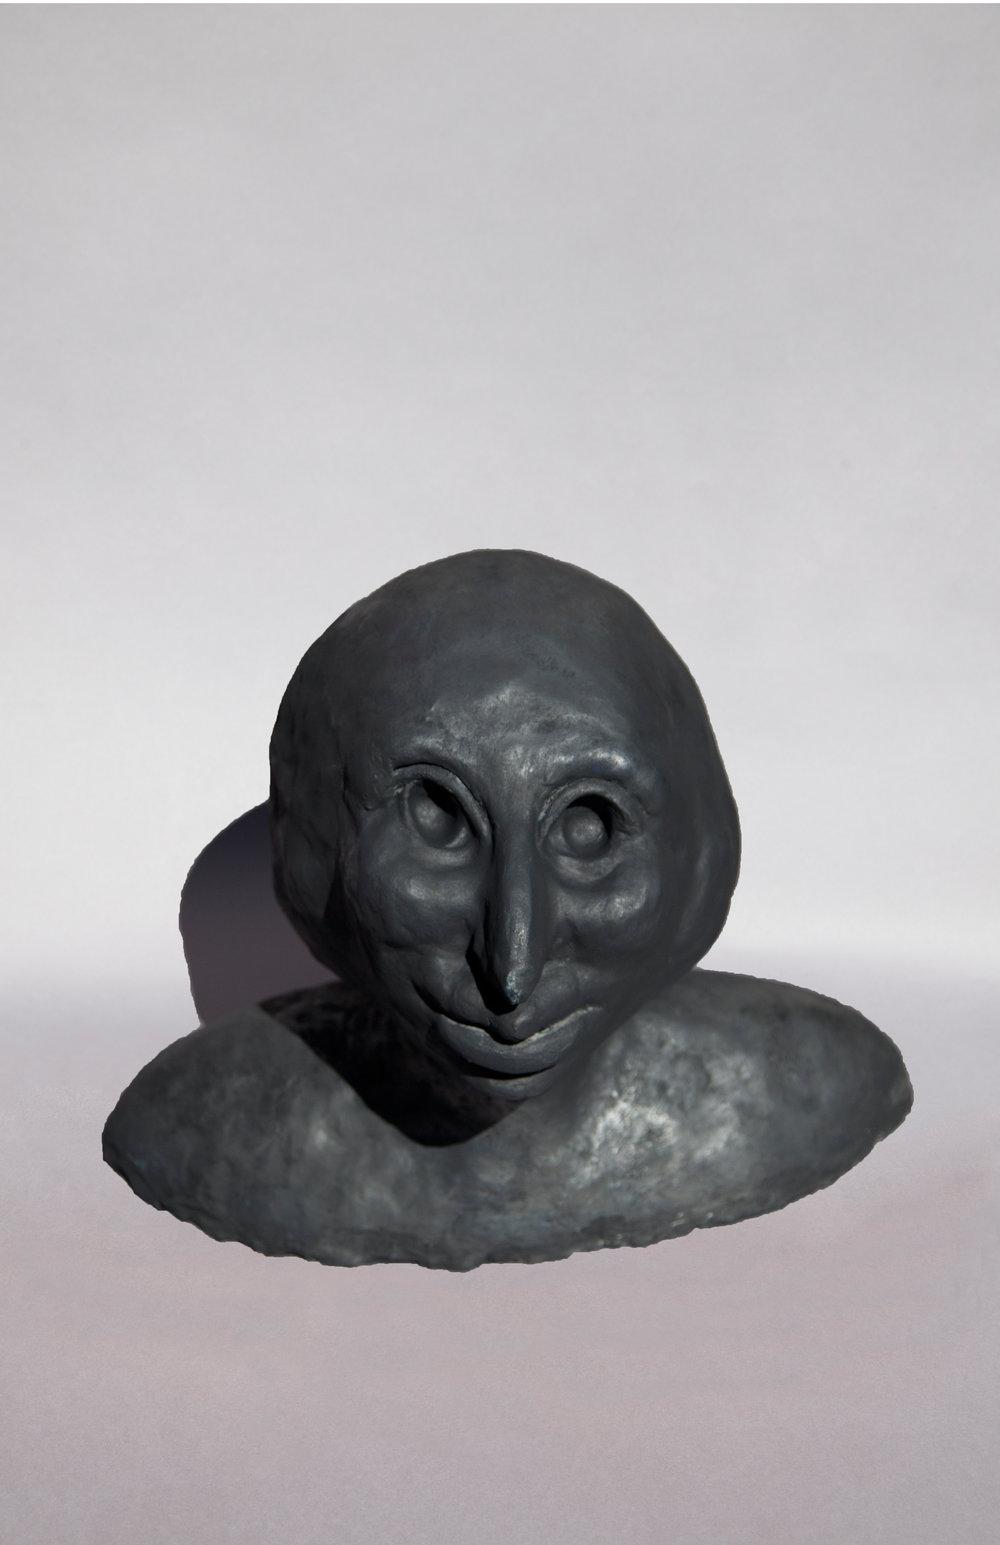 Talisman Series: Man Joking at Night, graphite on ceramic, 17.5HX21WX14D